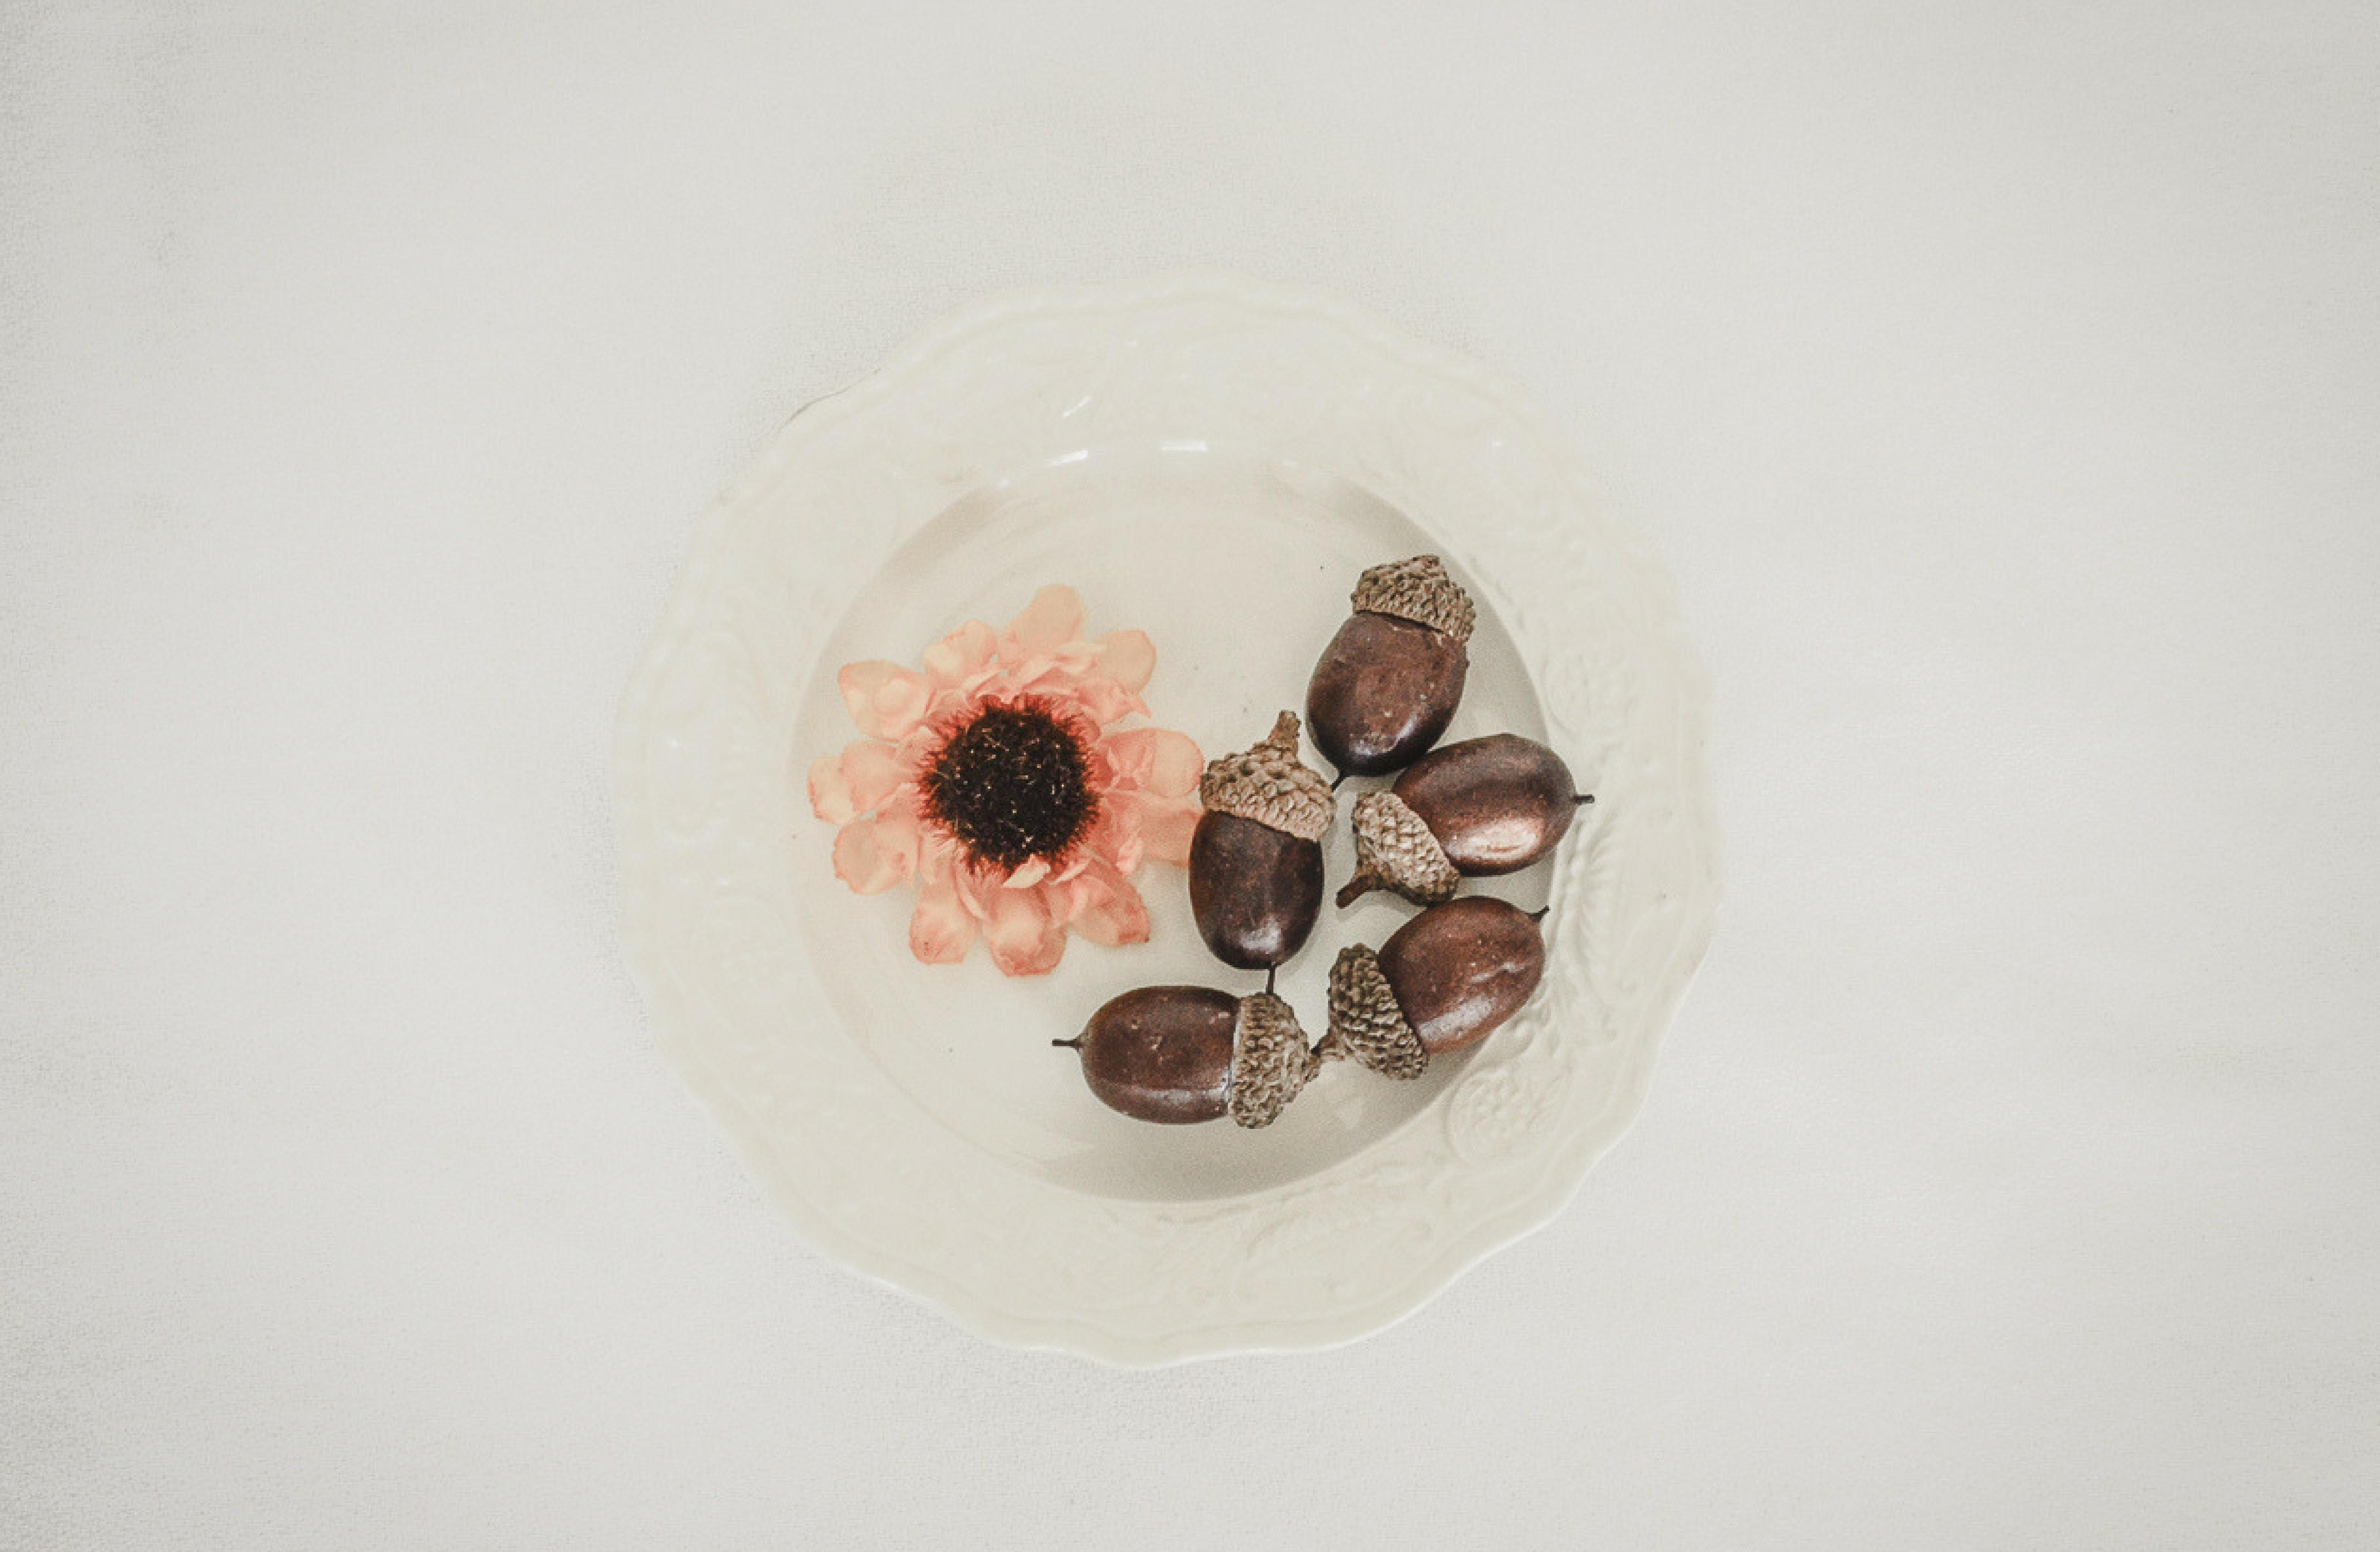 acorns in bowl